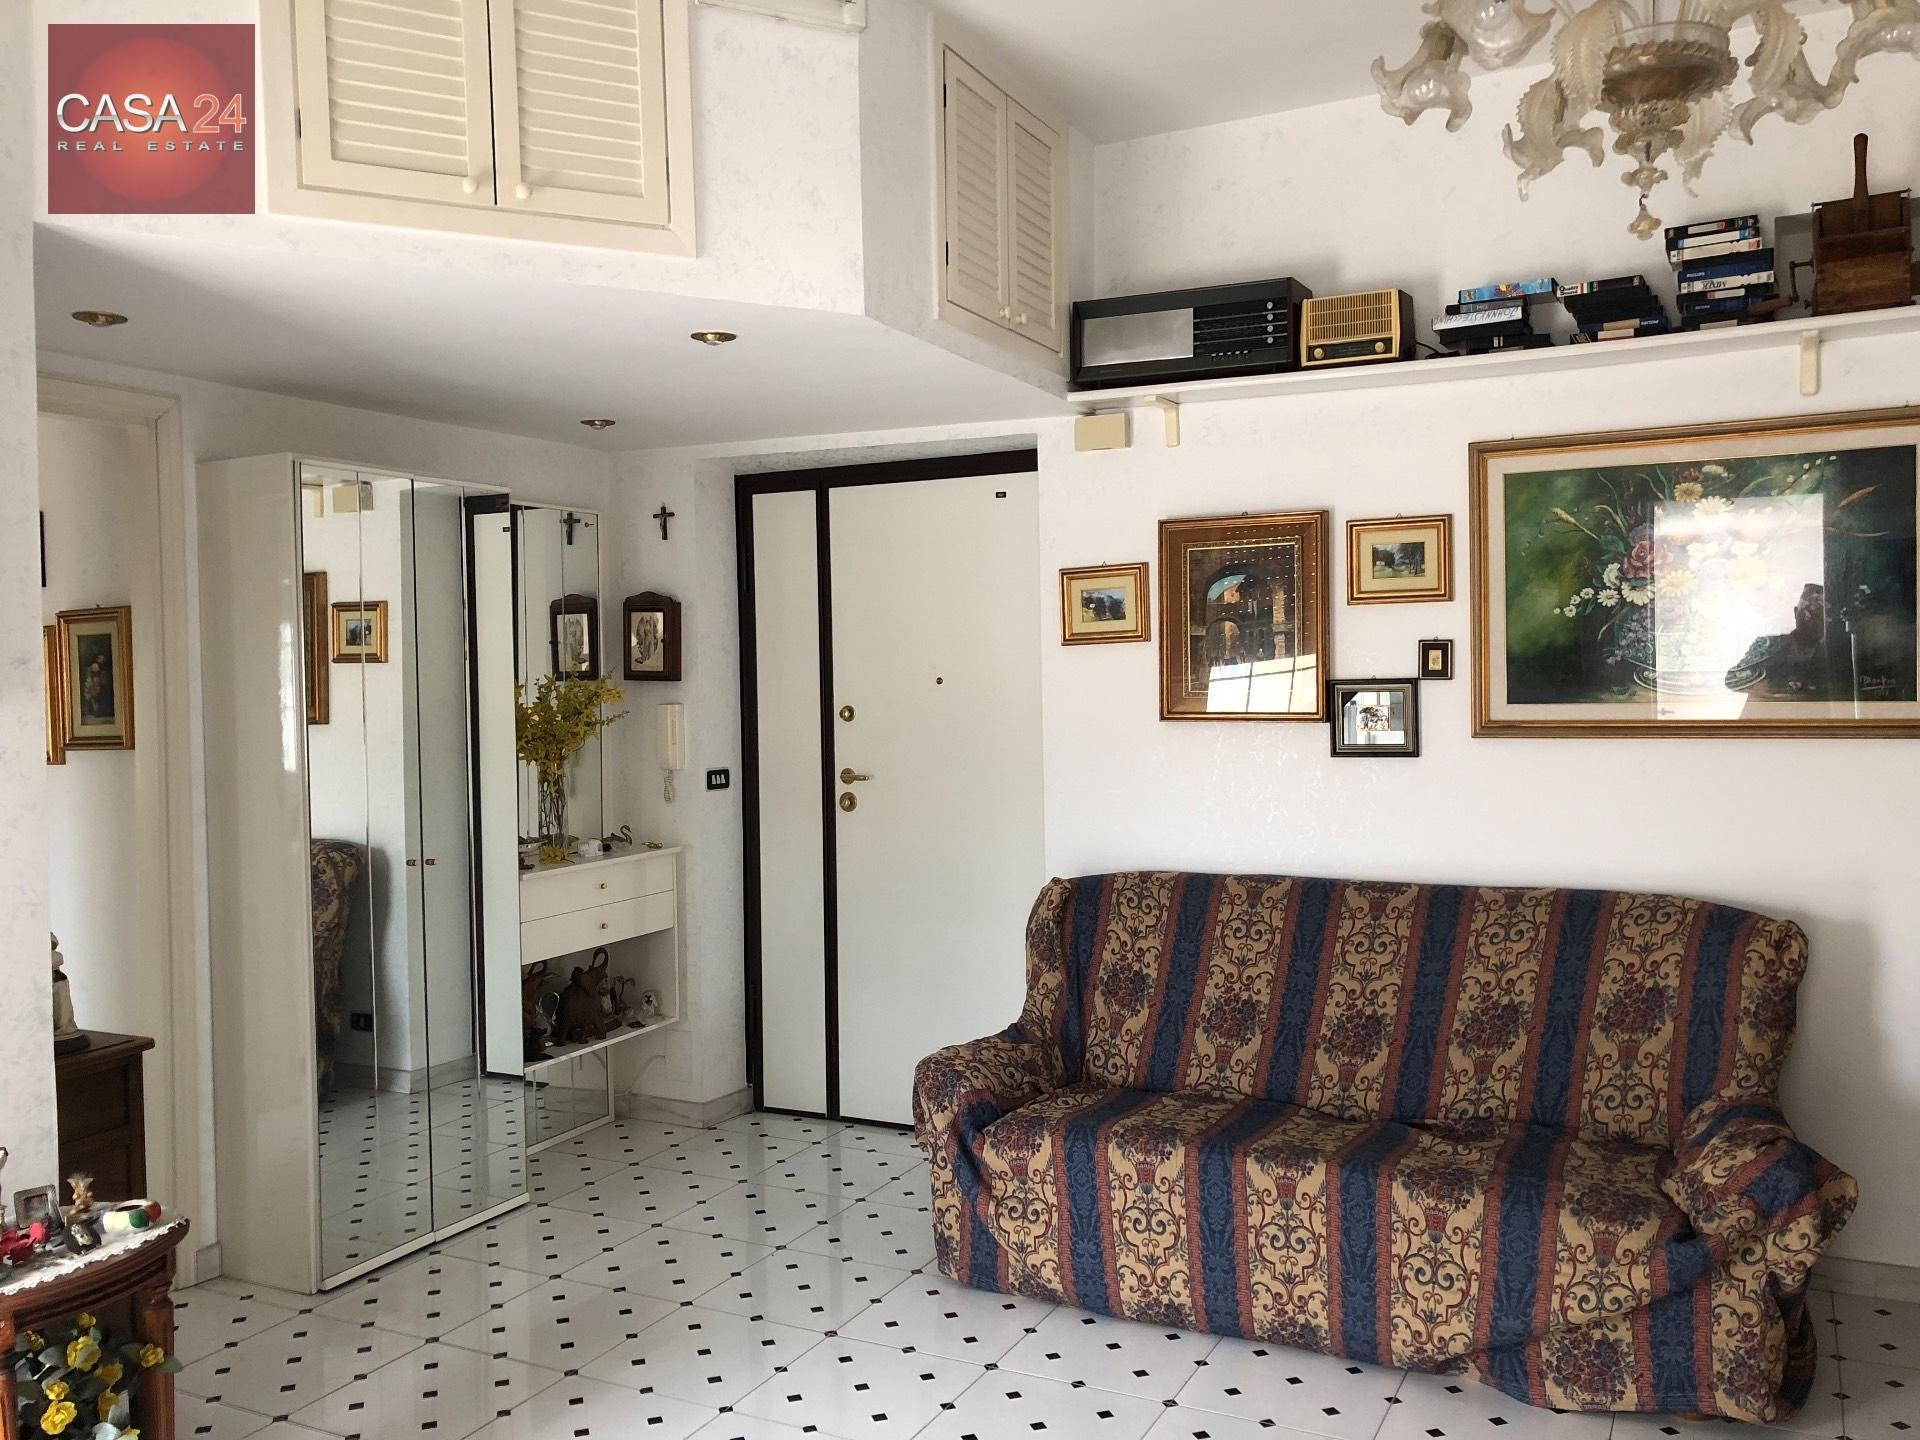 latina vendita quart: r1 zona tribunale casa24-real-estate